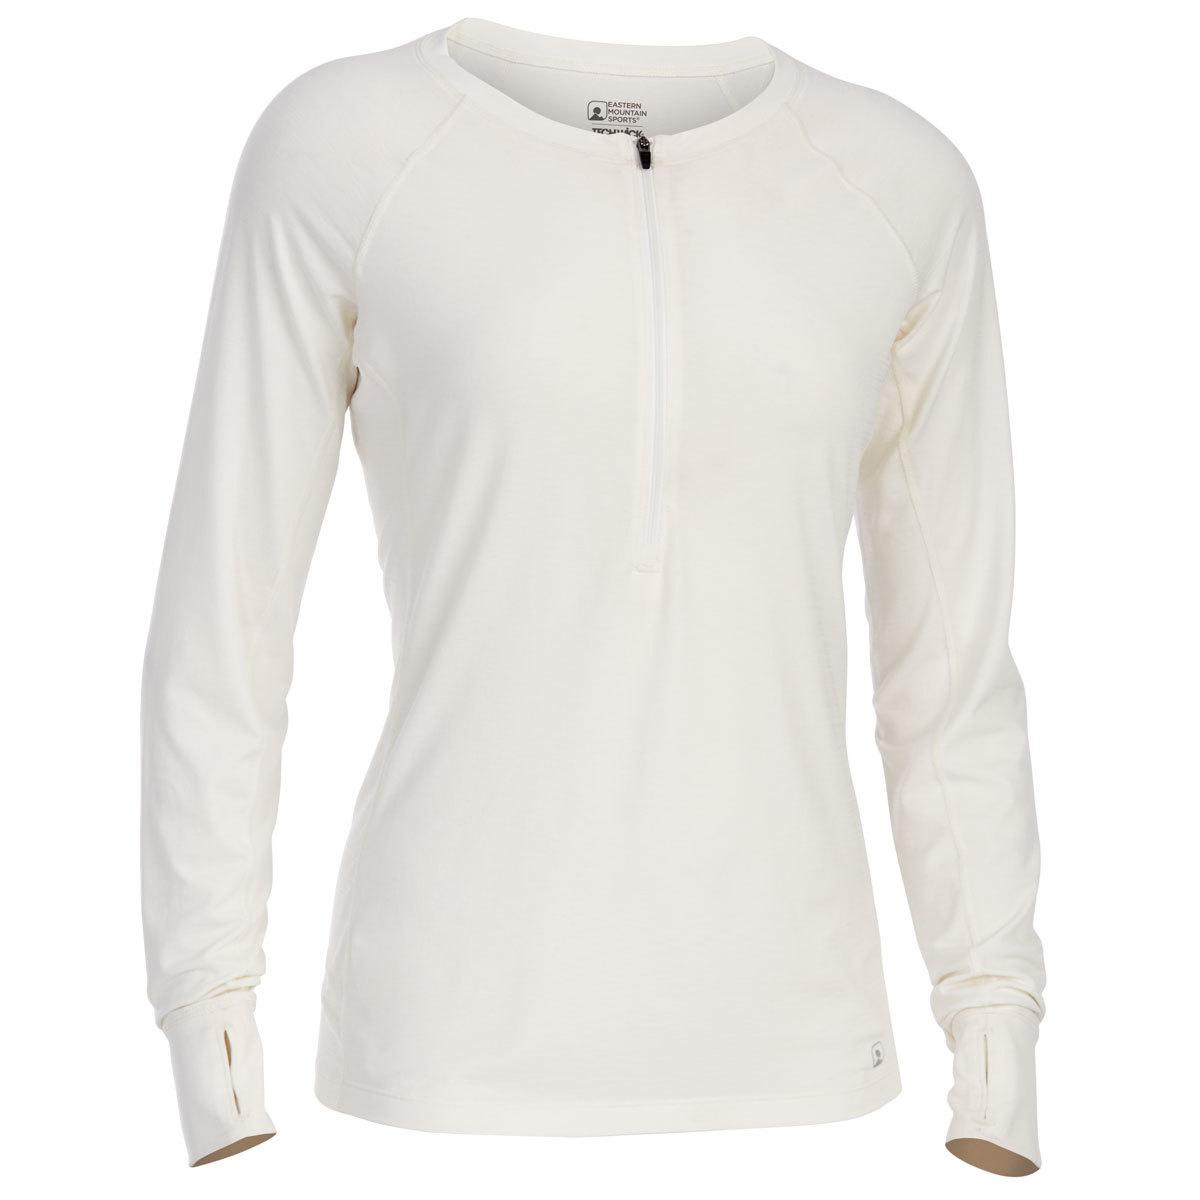 Ems Women's Techwick Hydro Upf Half Zip - White, XL